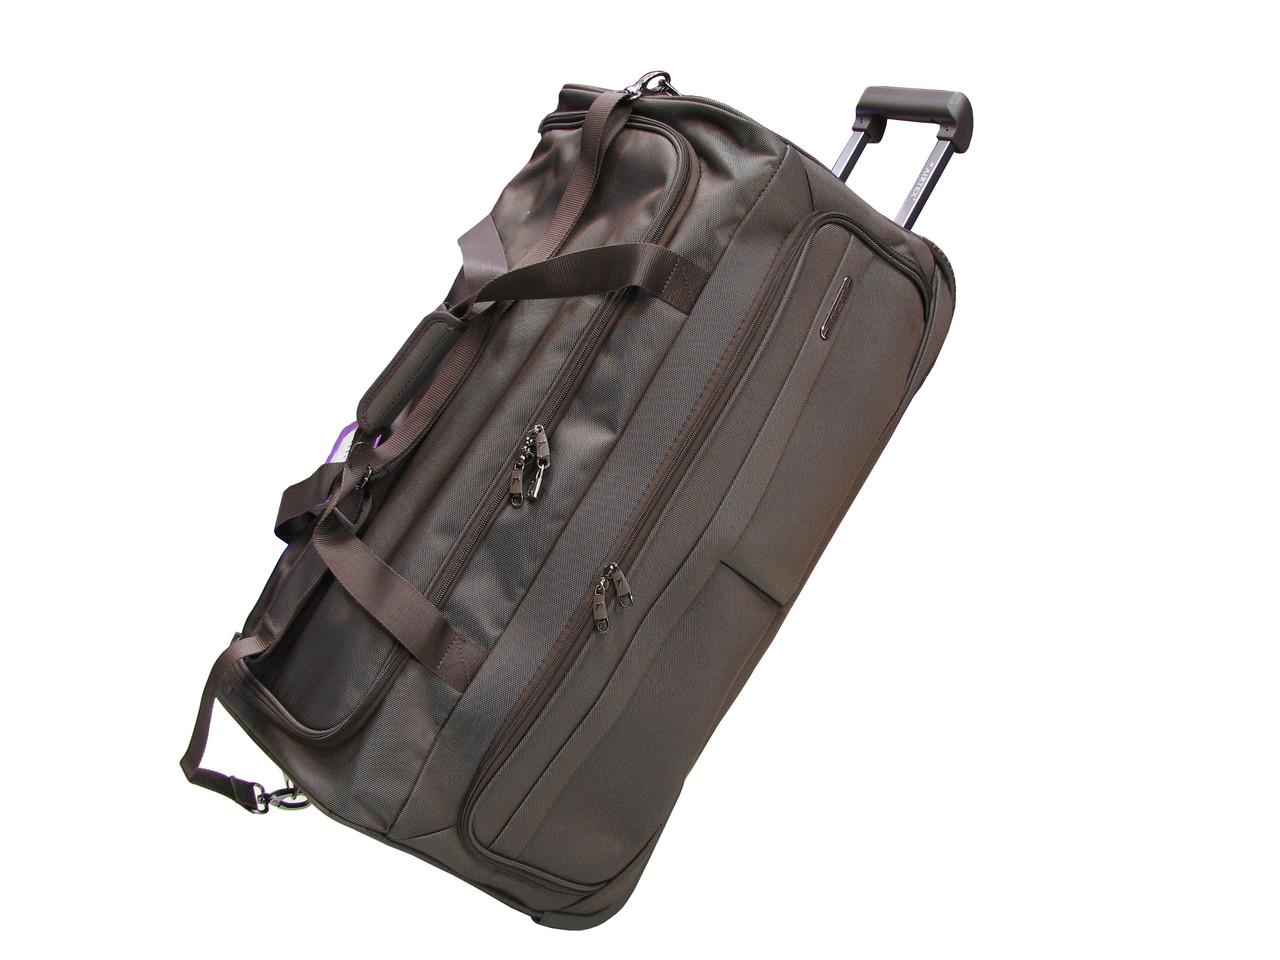 ce69edf83592 Дорожная сумка на колесах среднего размера Airtex 836 28  продажа ...